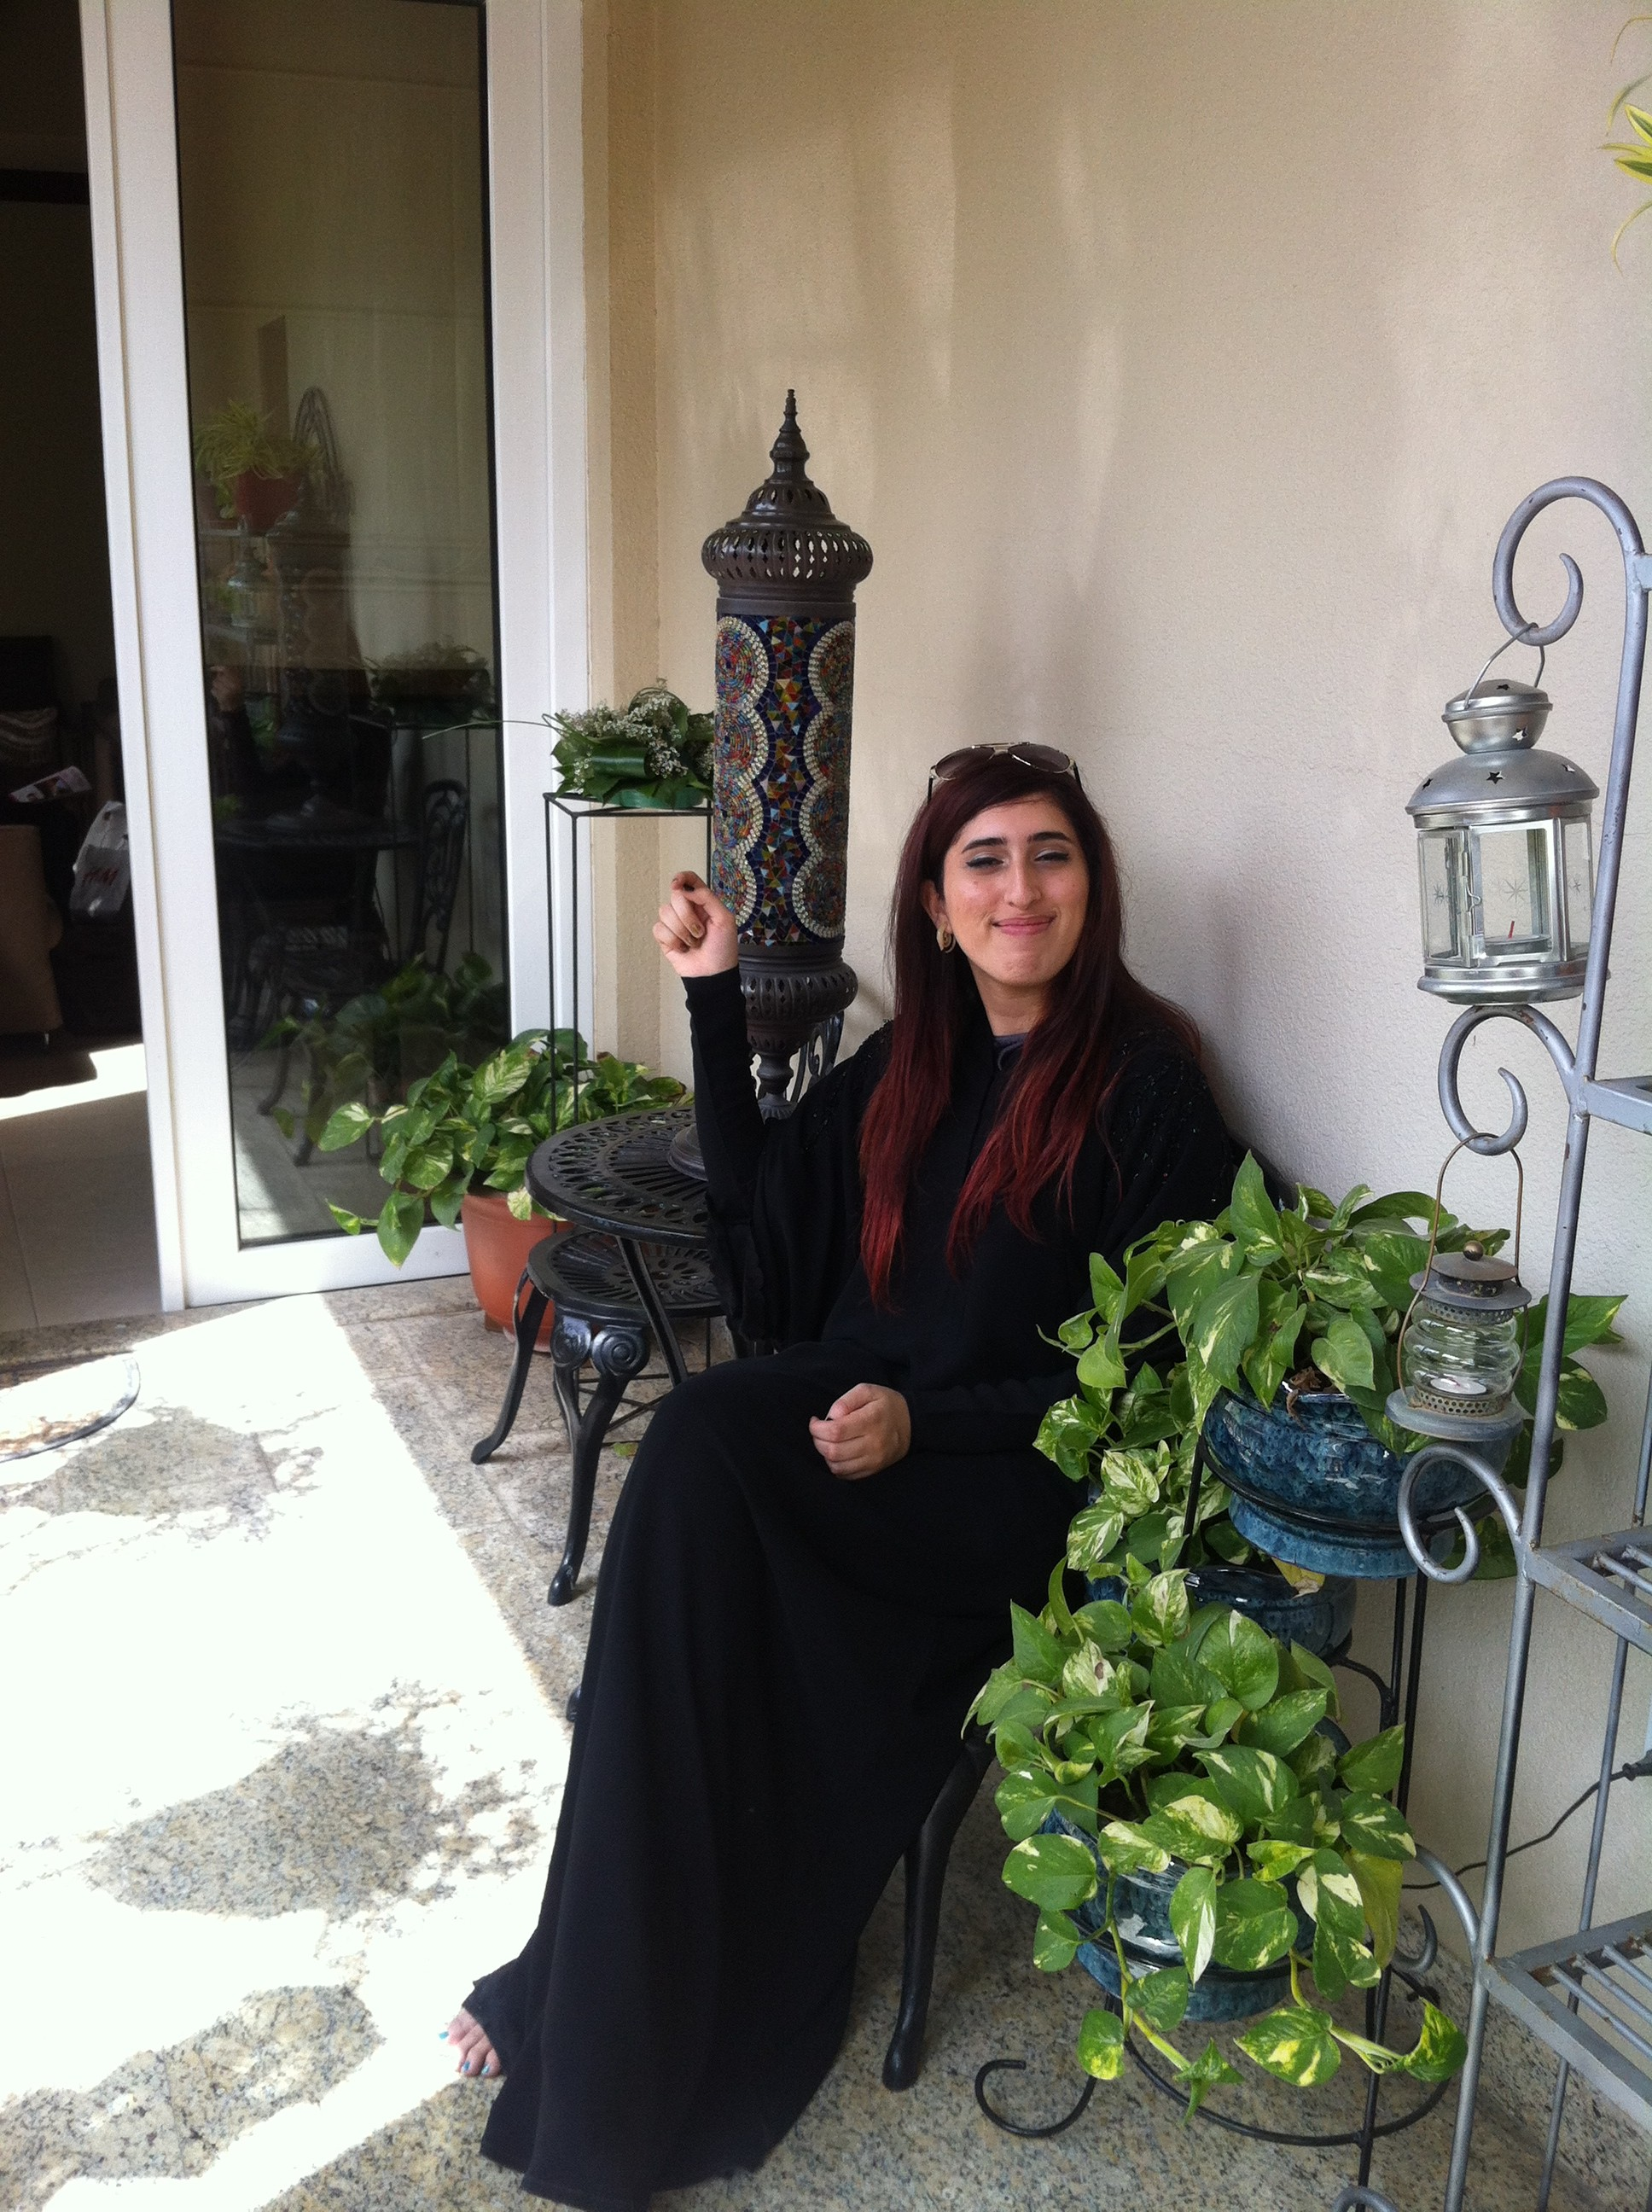 Hana outside of her grandmother's house in Dubai (Hana Shafi / Ryersonian Staff)